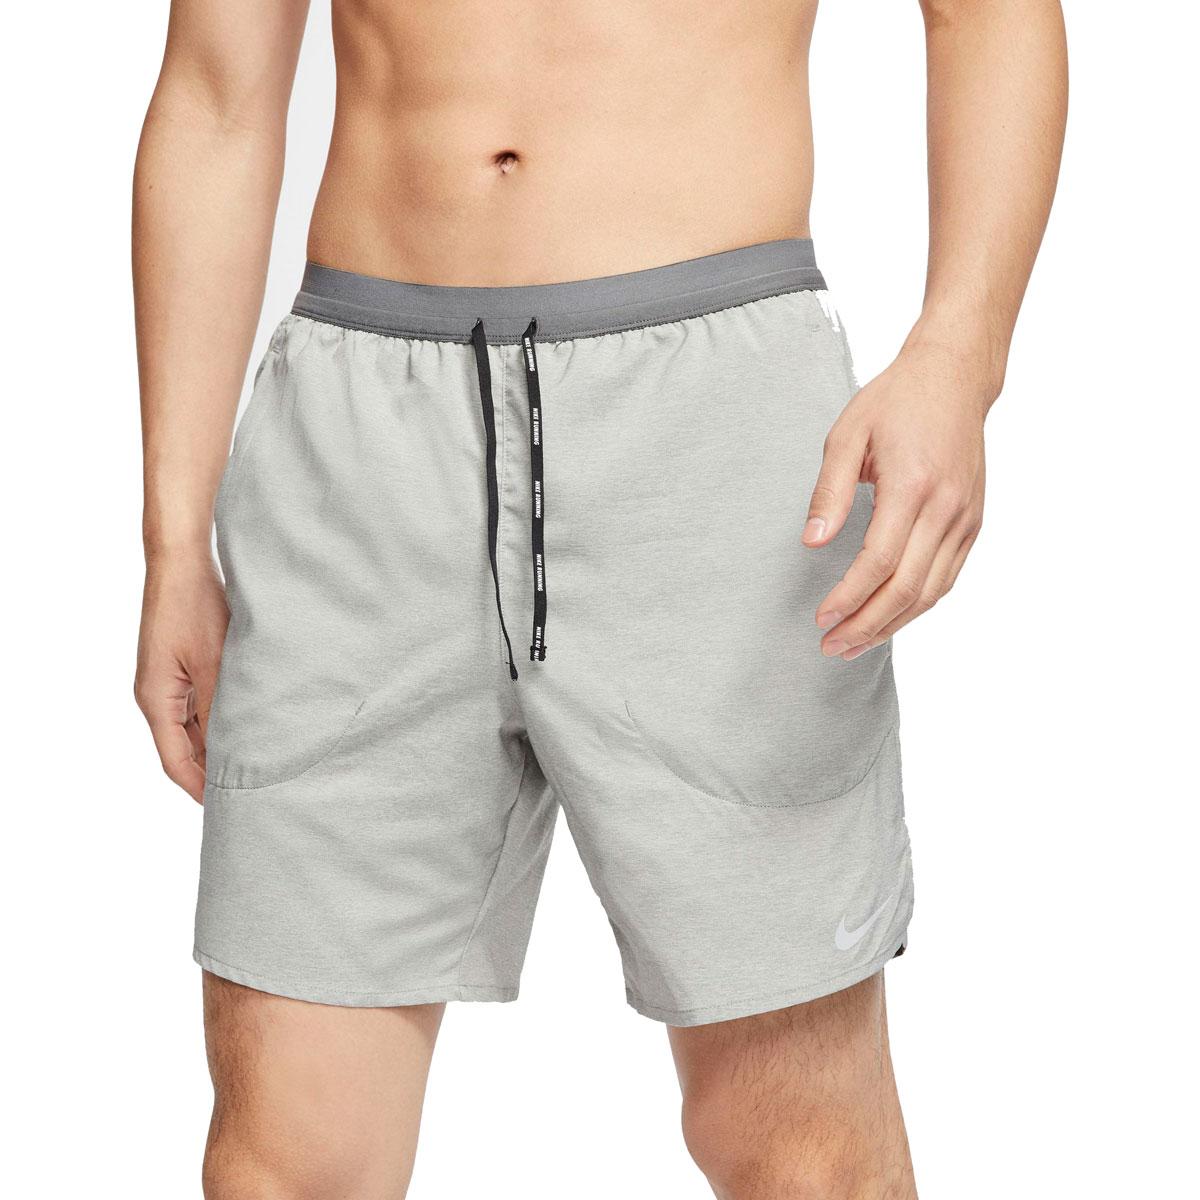 "Men's Nike Flex Stride 7"" Brief Running Shorts - Color: Iron Grey/Heather/Reflective Silver - Size: S, Iron Grey/Heather/Reflective Silver, large, image 1"